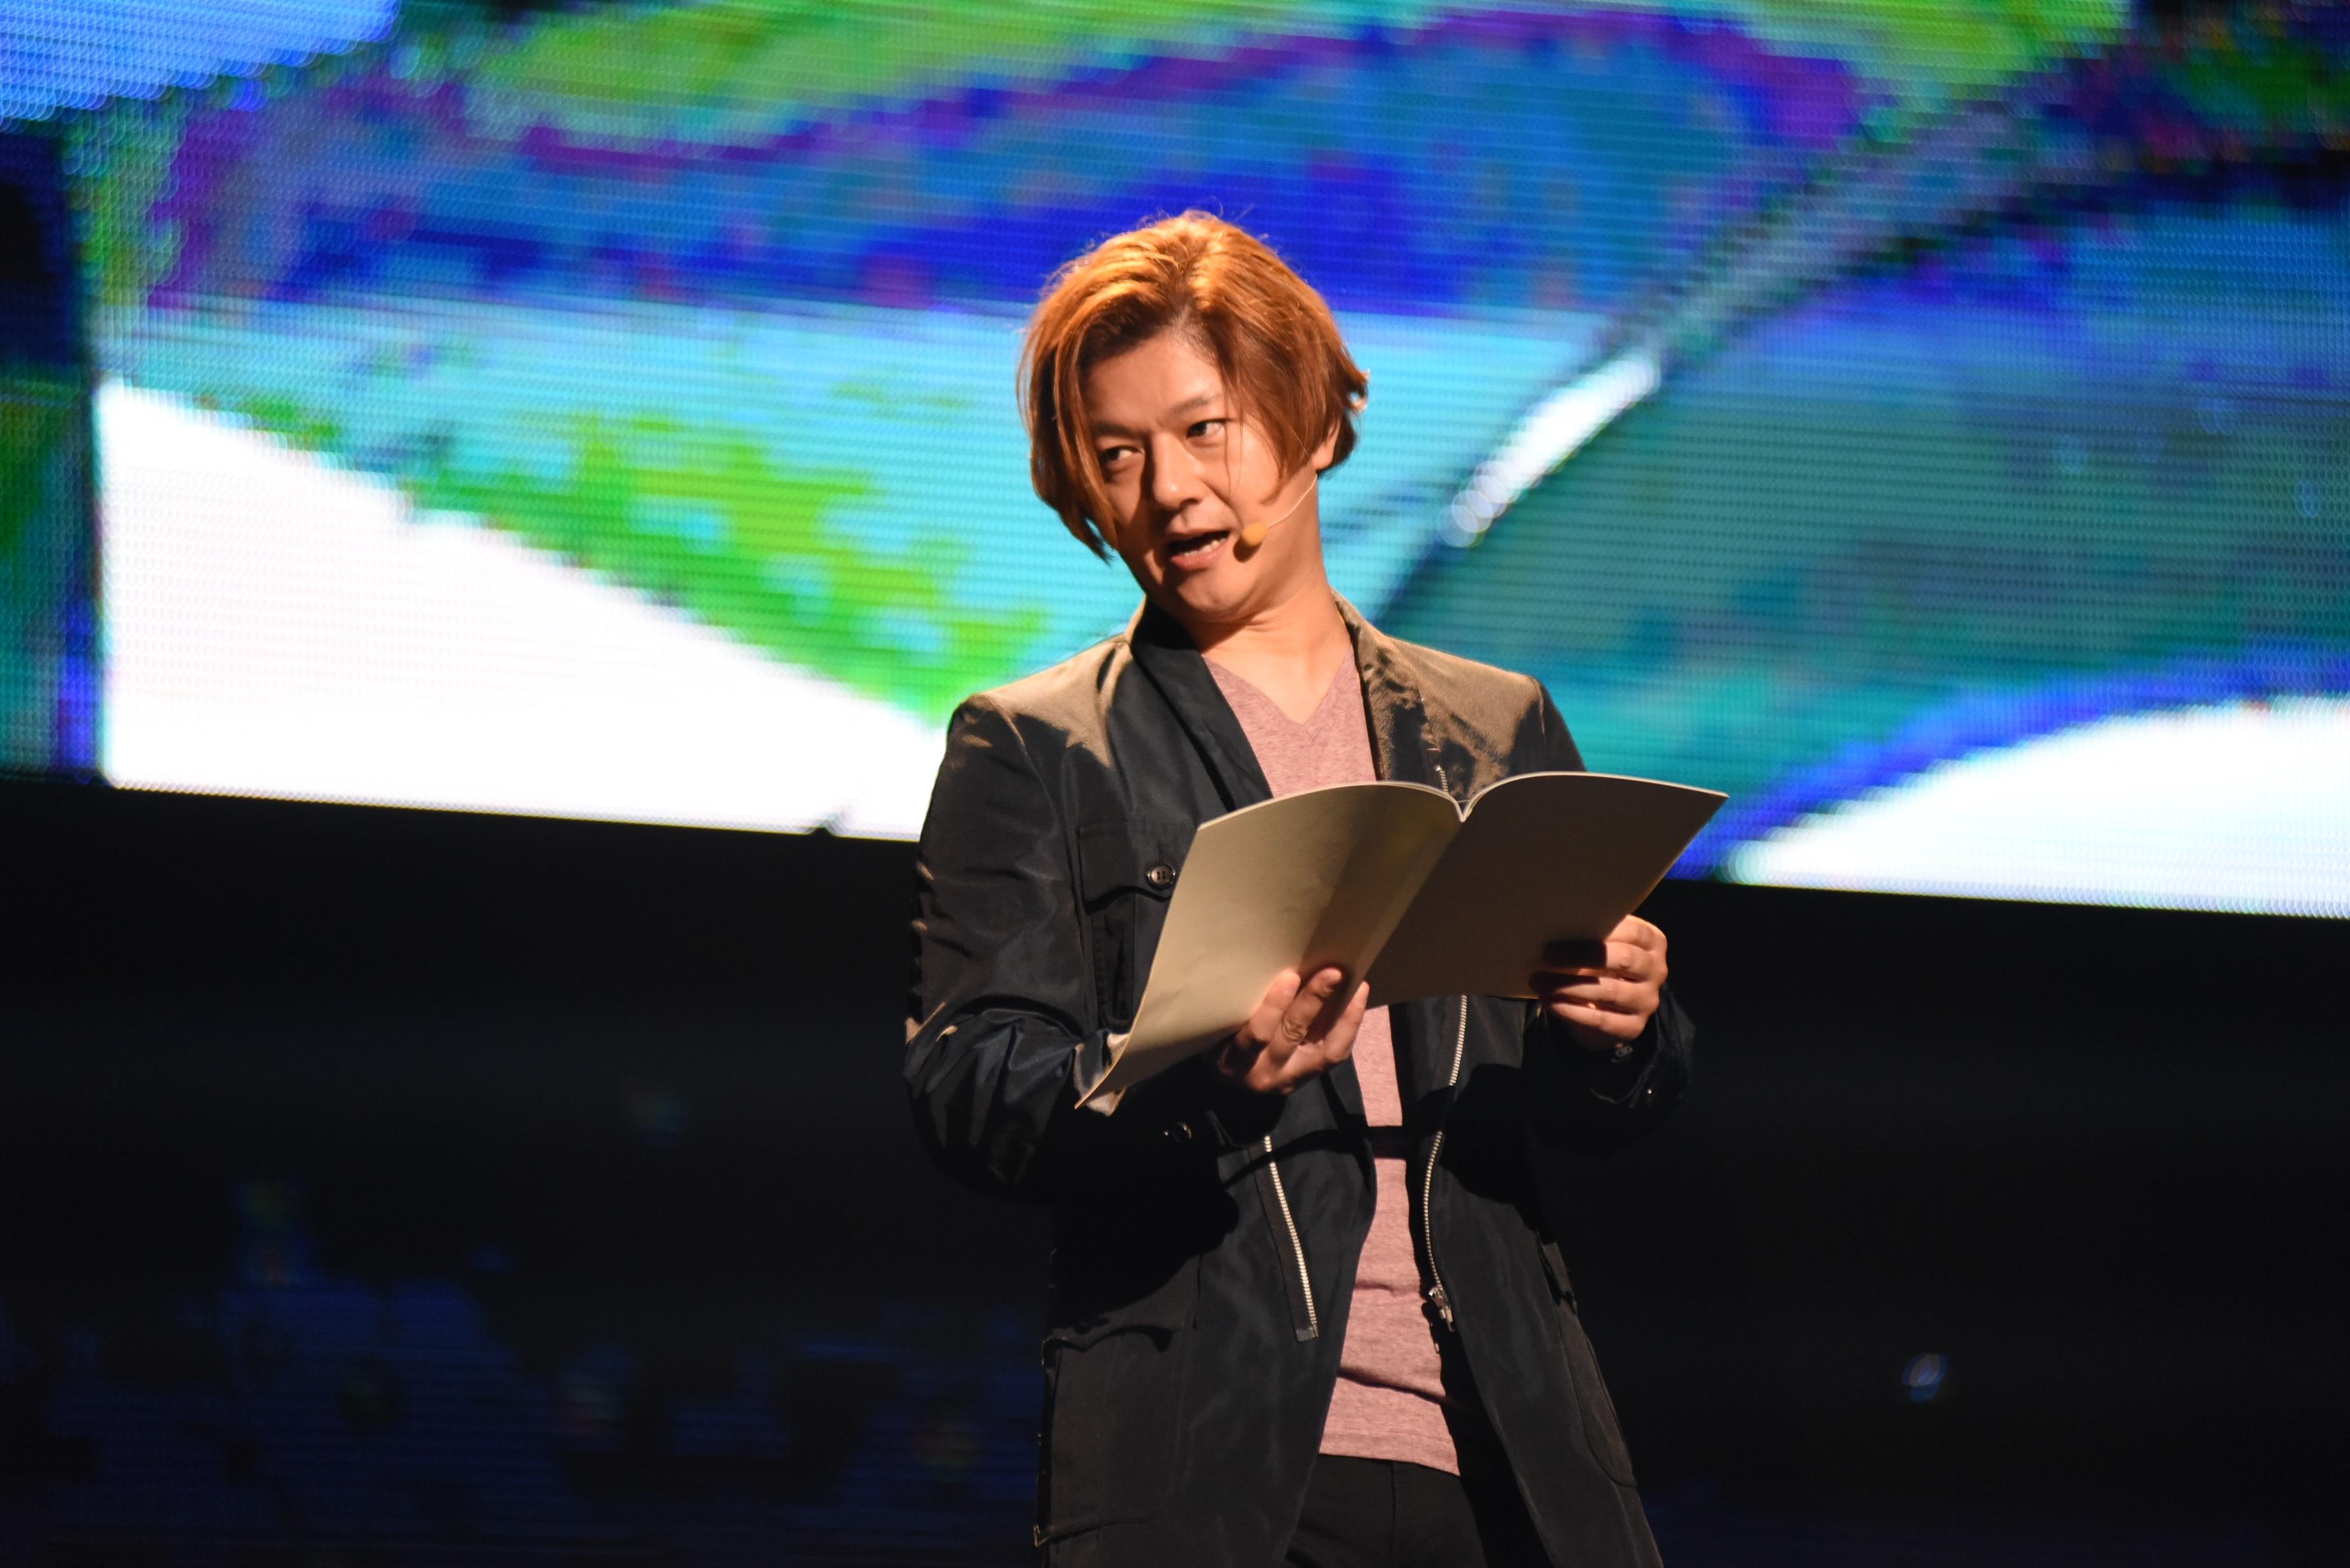 「MBSアニメフェス2018」放送局を飛び越えて『ハルヒ』『おそ松さん』『進撃の巨人』がサプライズ参戦! 当日の模様を公式レポートで大公開